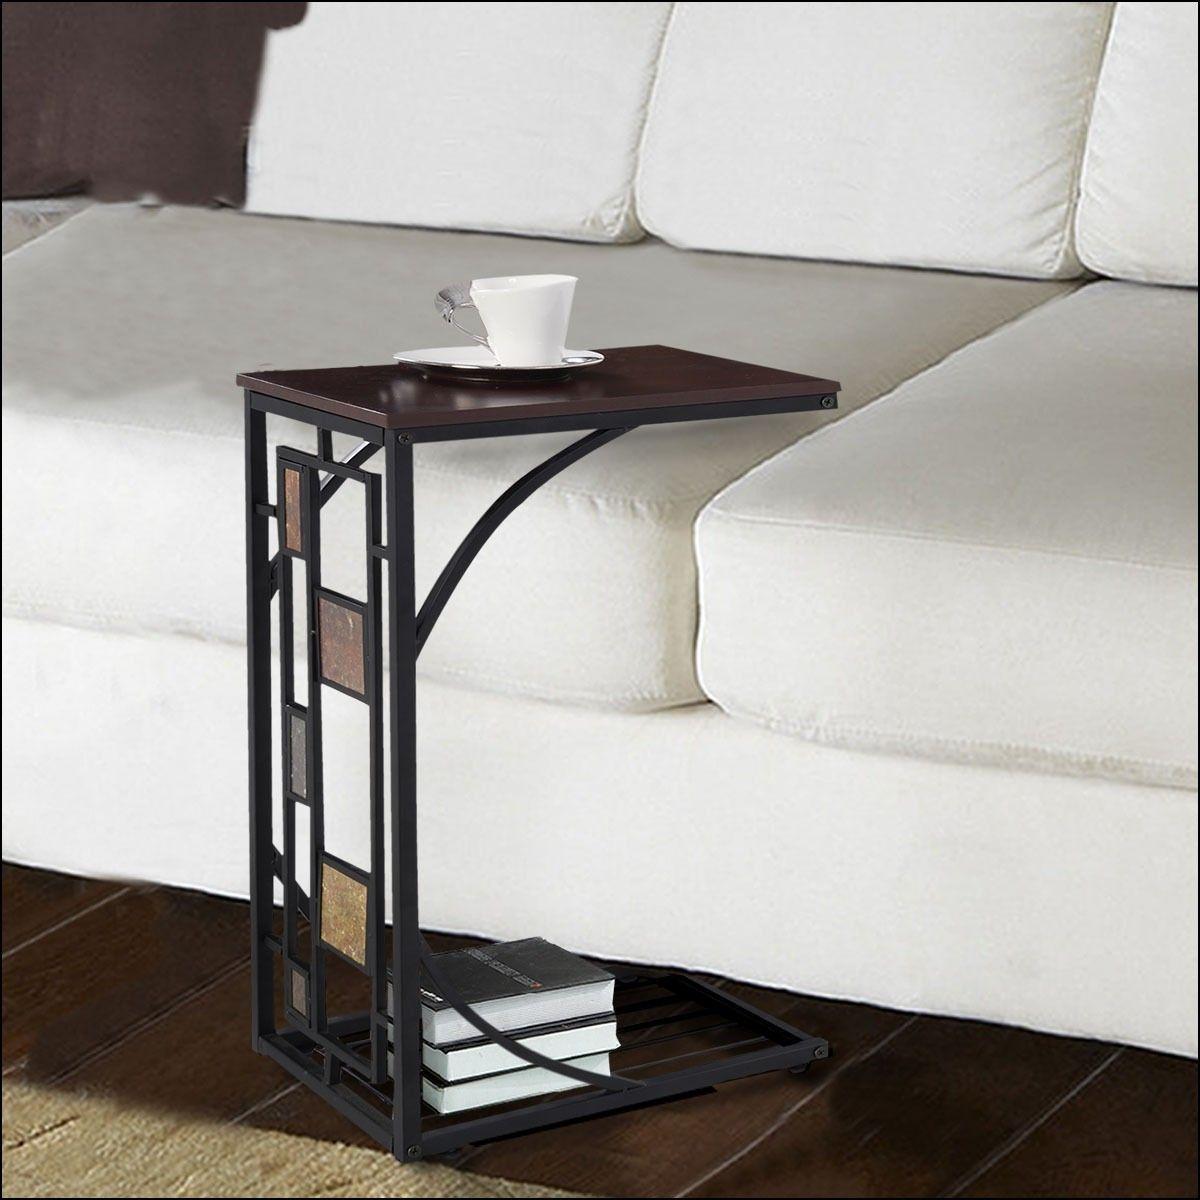 C Shaped Sofa Table